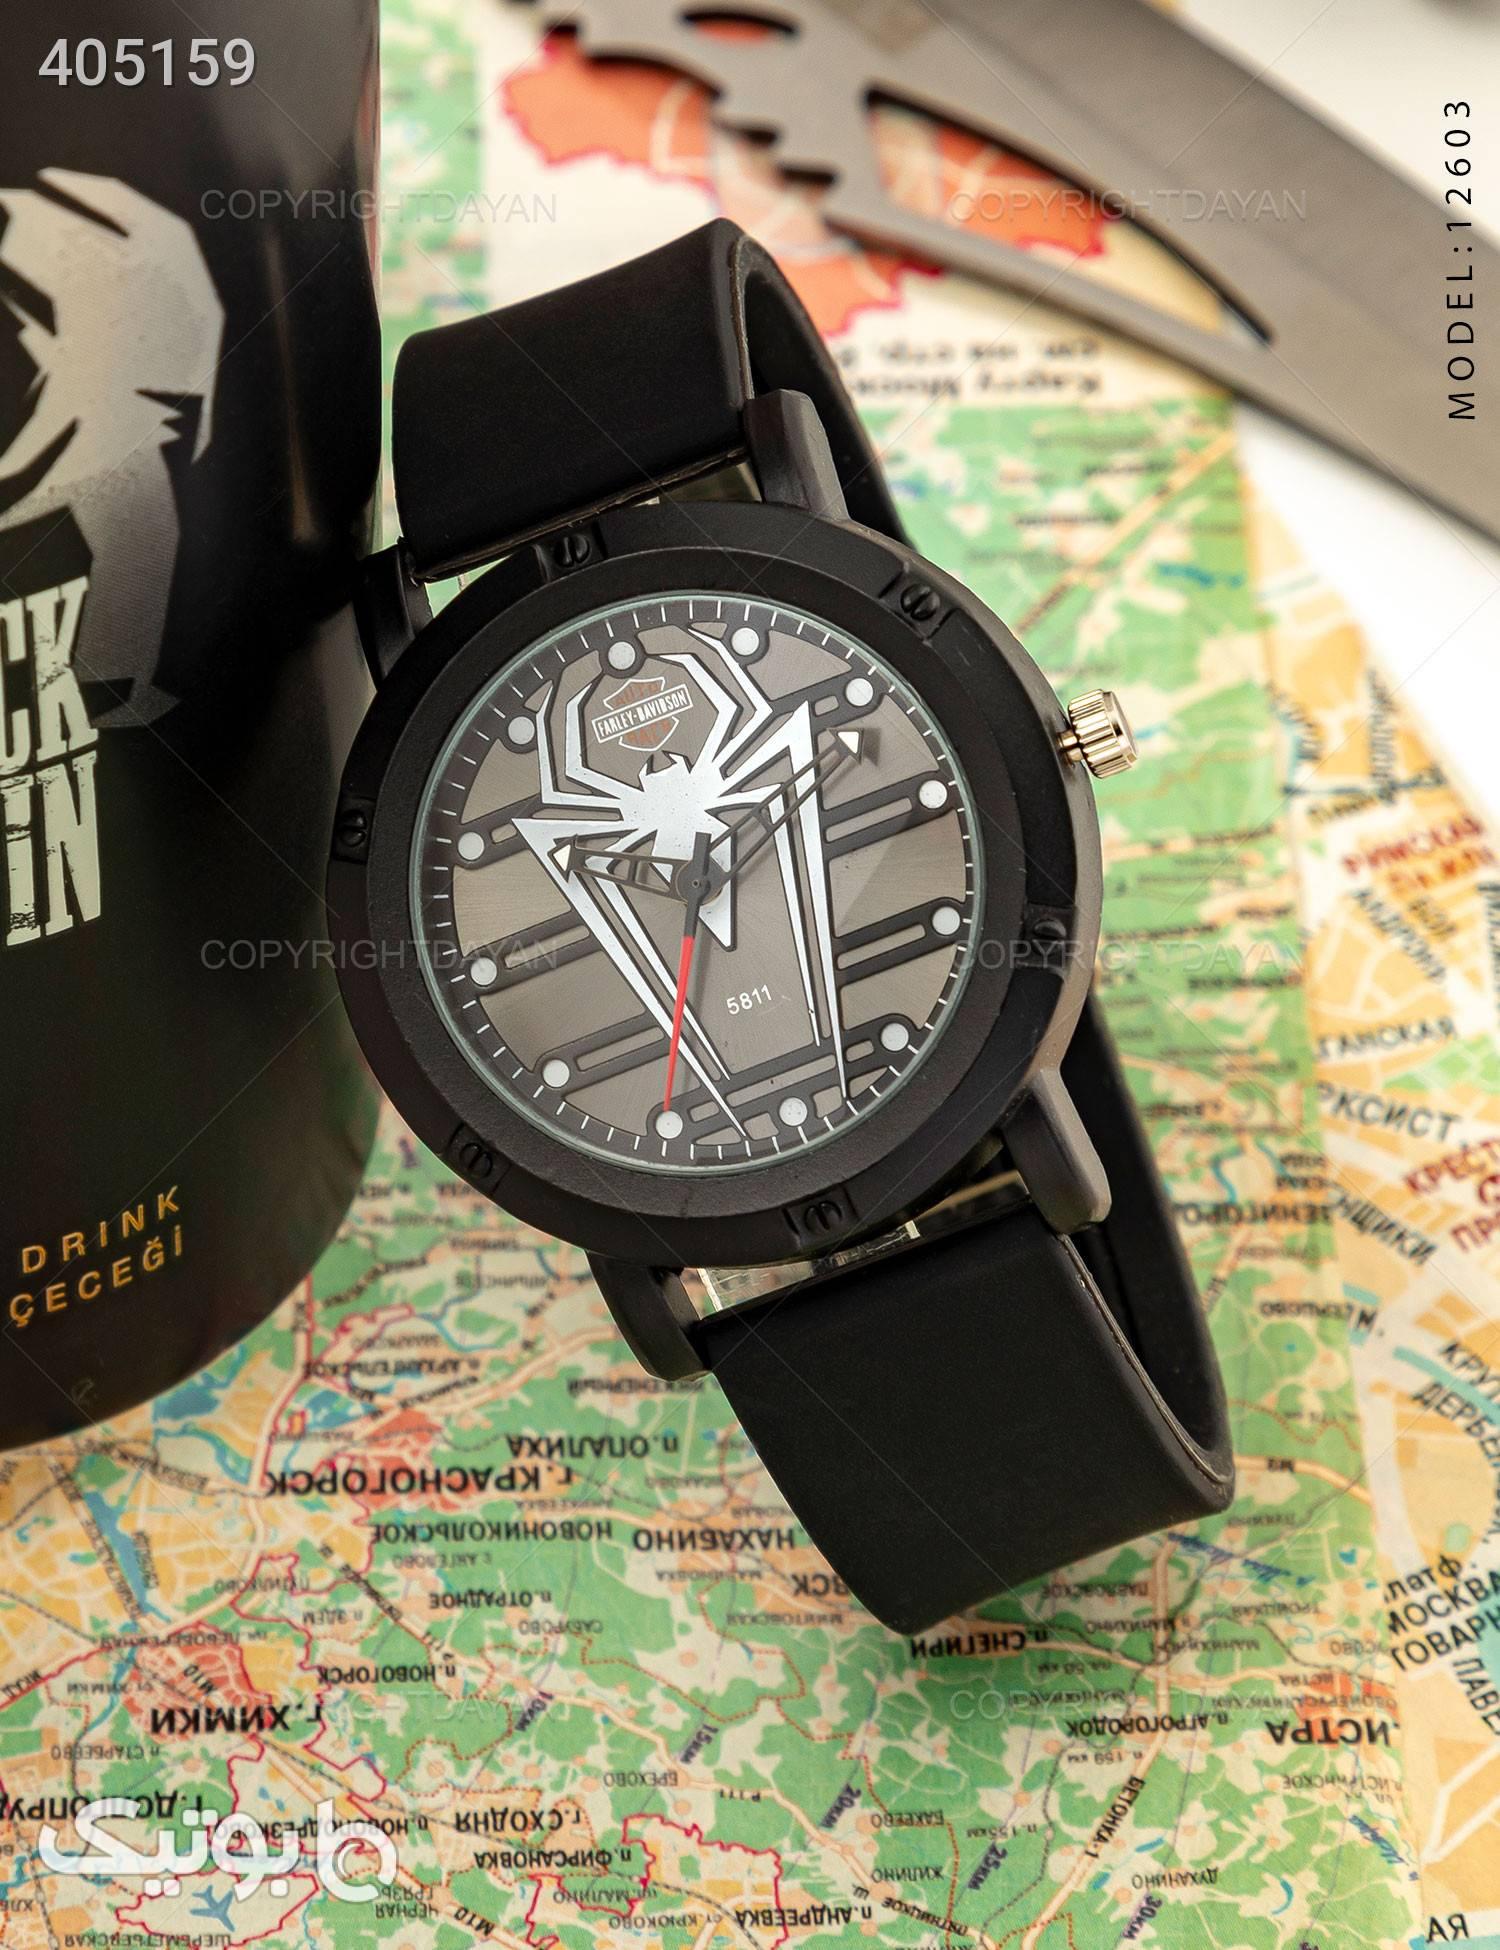 ساعت مچی مردانه Araz مدل  12603 مشکی ساعت